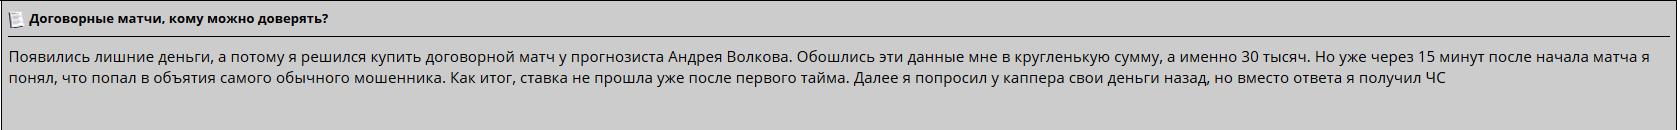 paralays.pro андрей волков